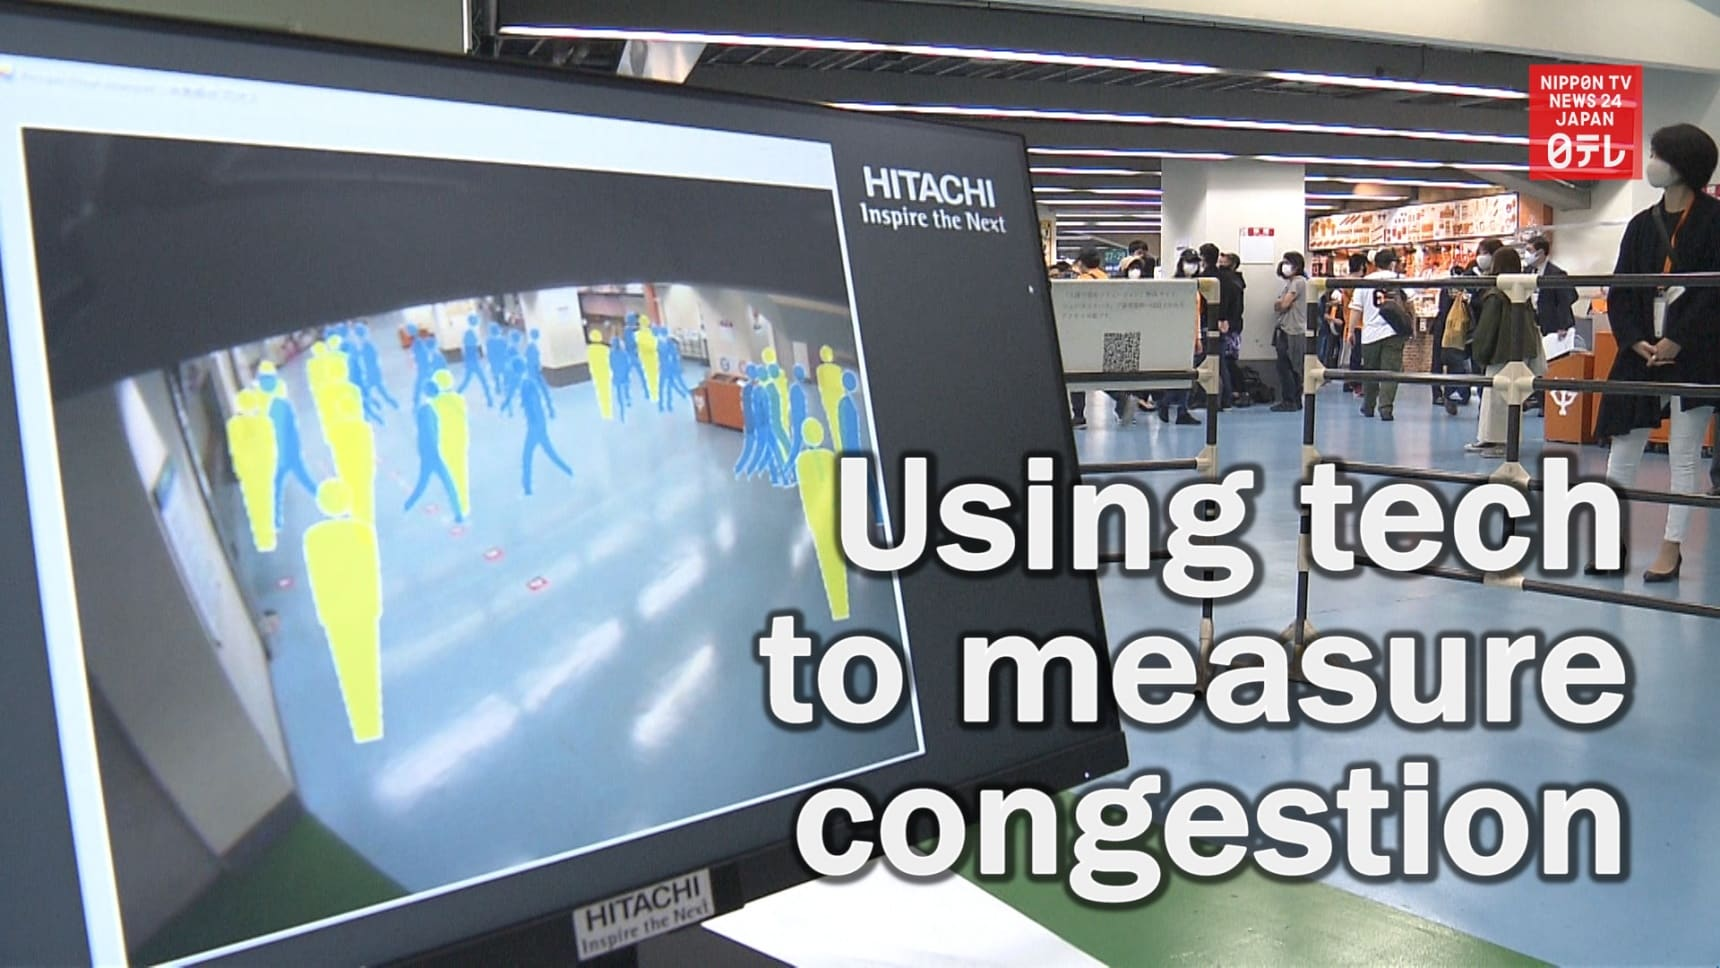 Tech That Measures Congestion in Indoor Areas